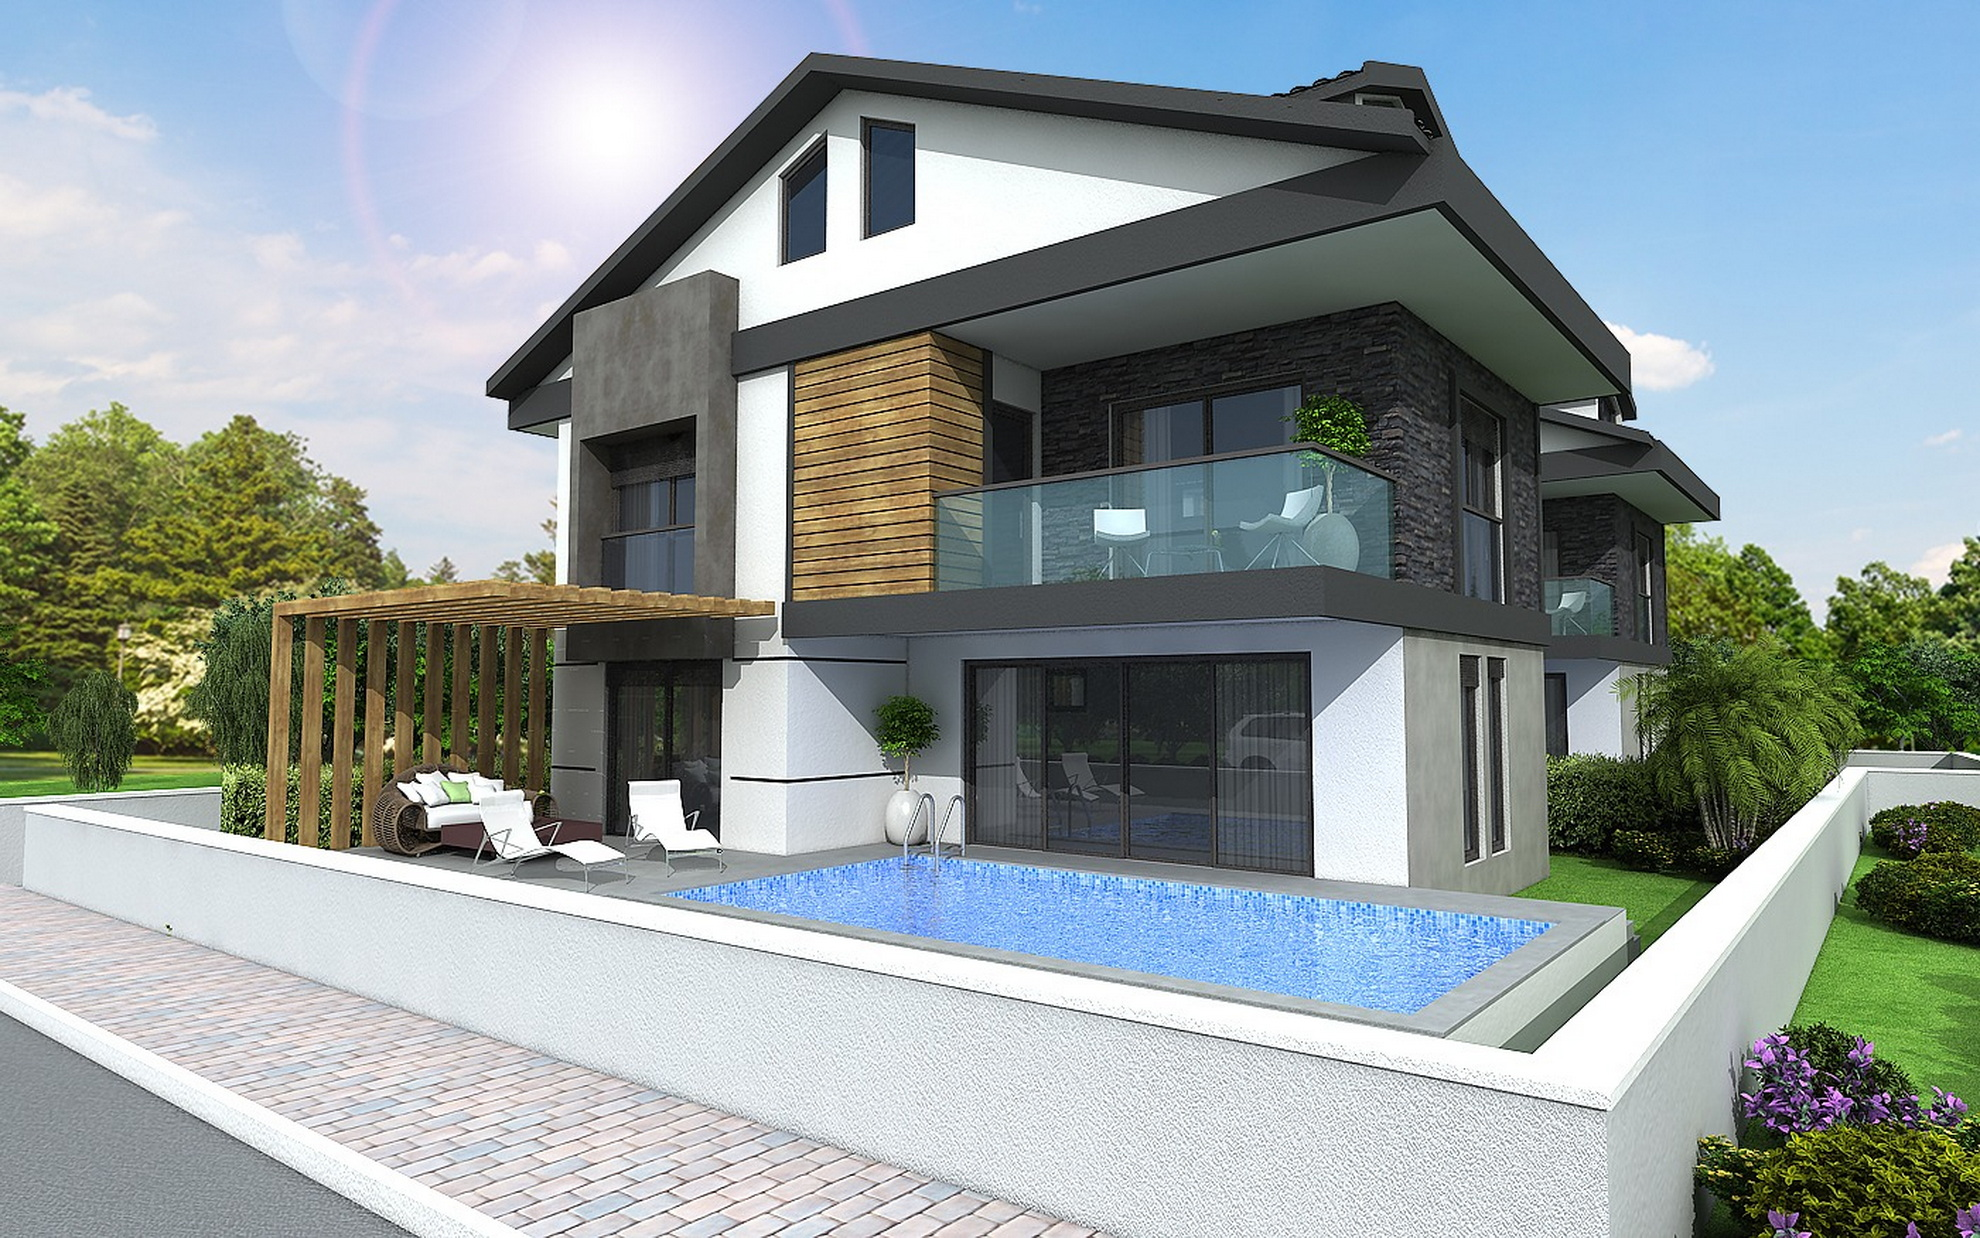 2 Sumptious Brand New Off Plan 4 Bedroom Villas